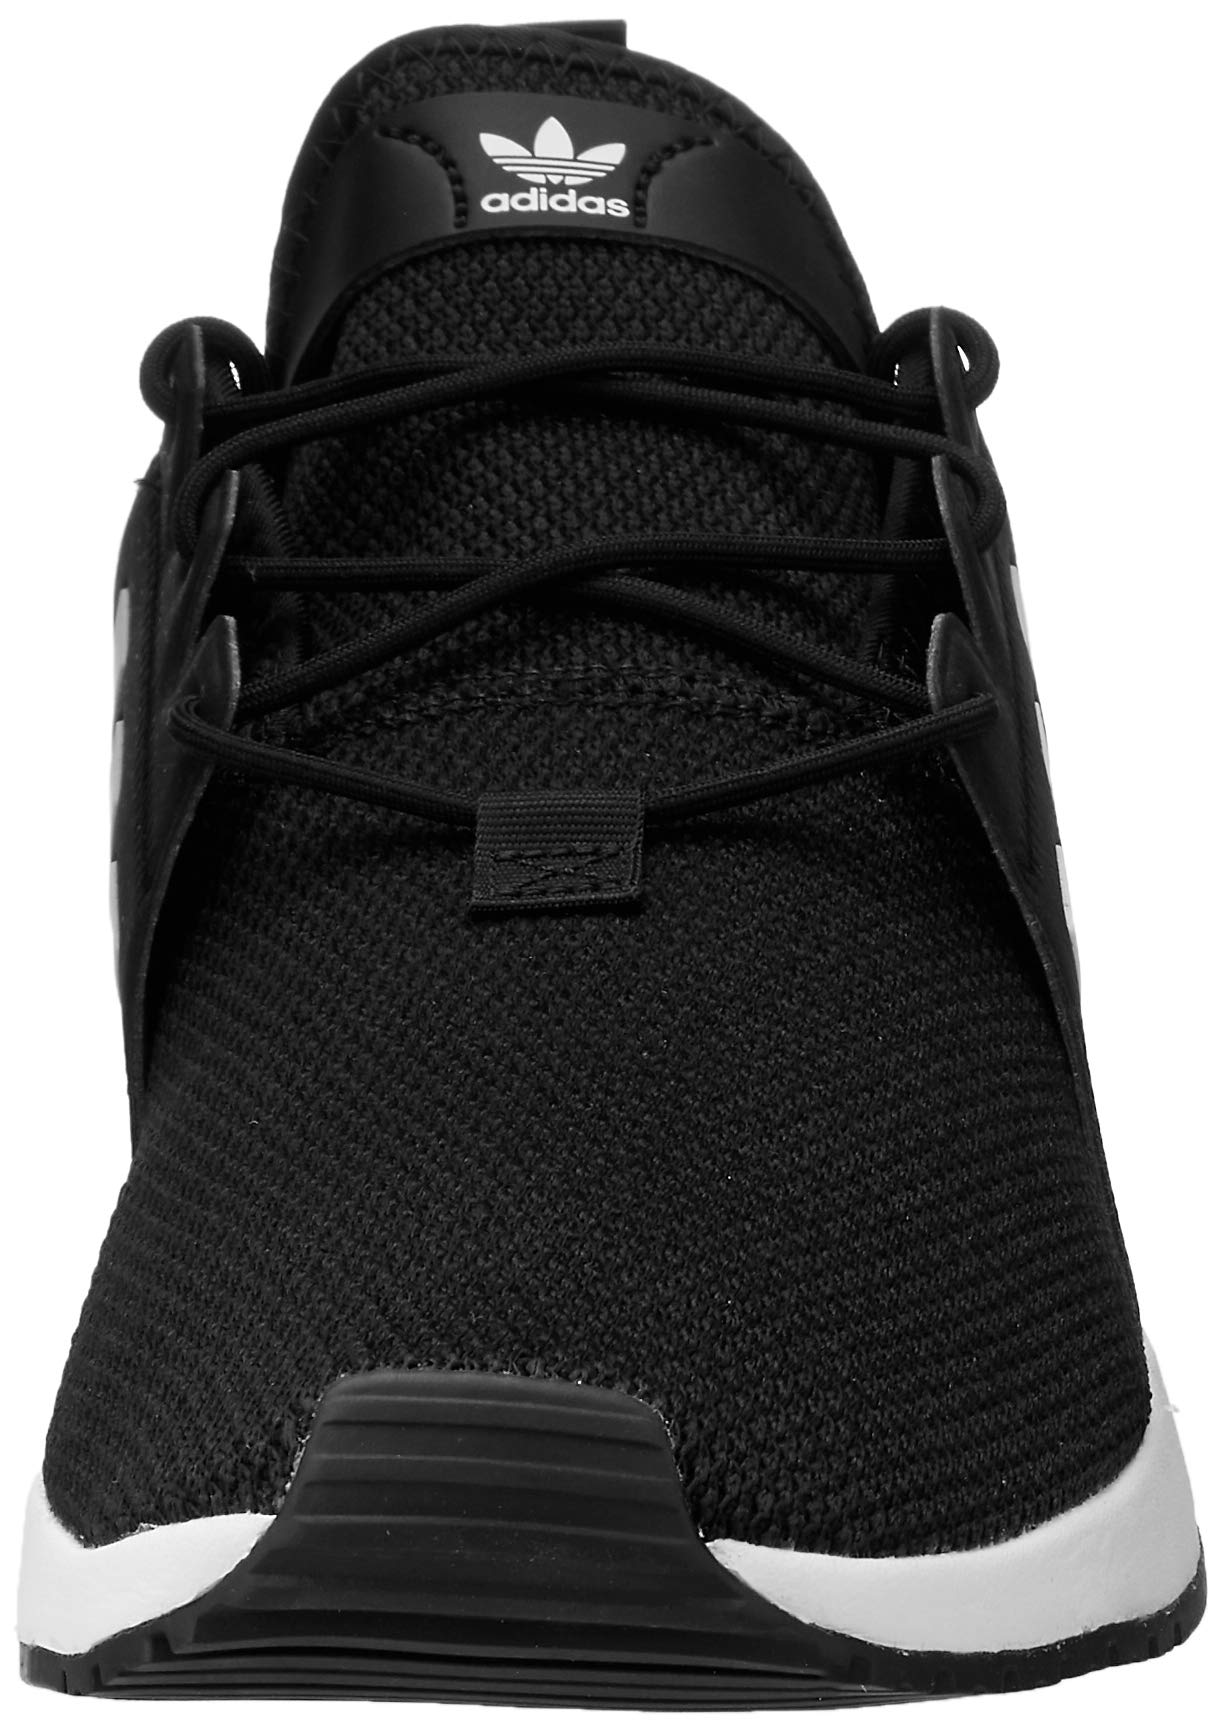 plrScarpe Da – X Fitness Adidas Uomo Spesavip Pk8wOXn0